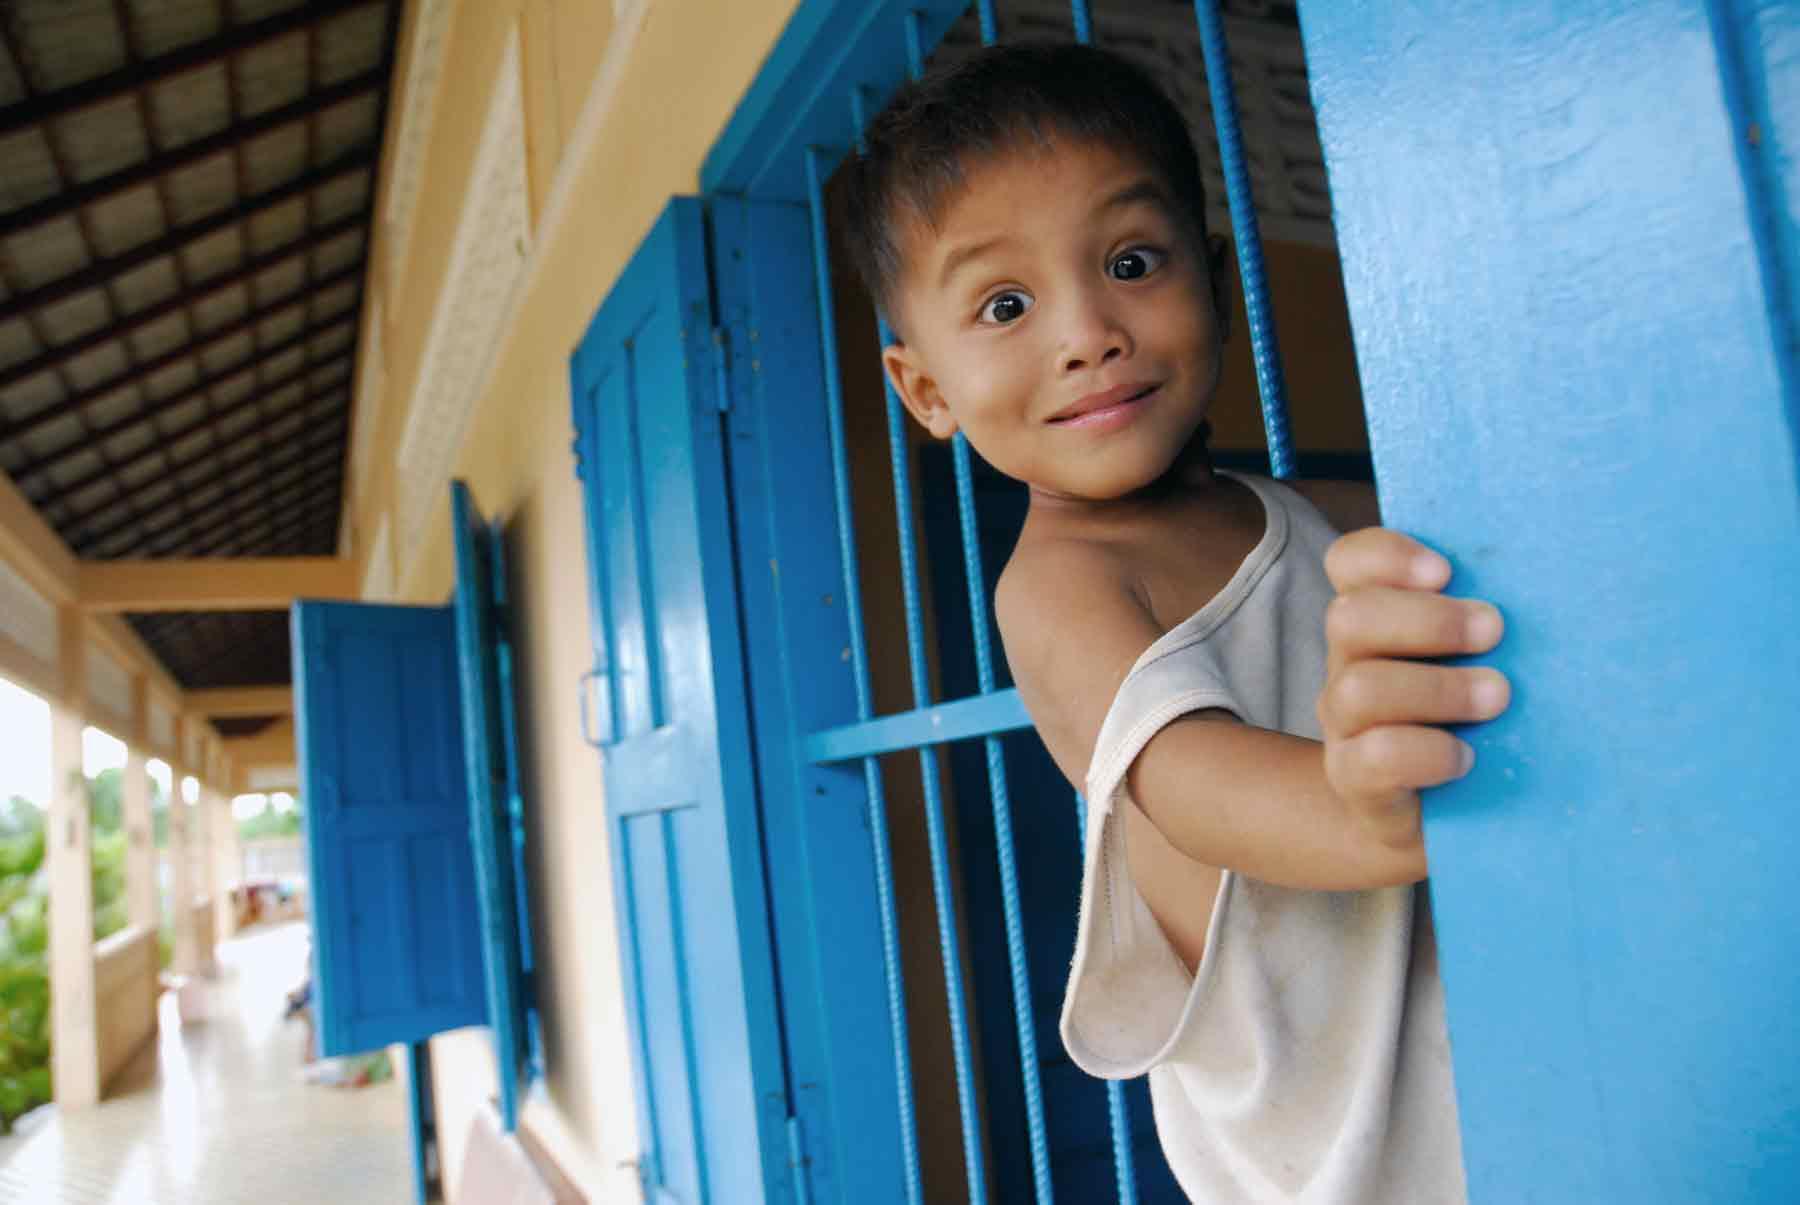 Kambodschanischer Junge, der unter dem Schutz der NGO AVEC in Kambodscha lebt